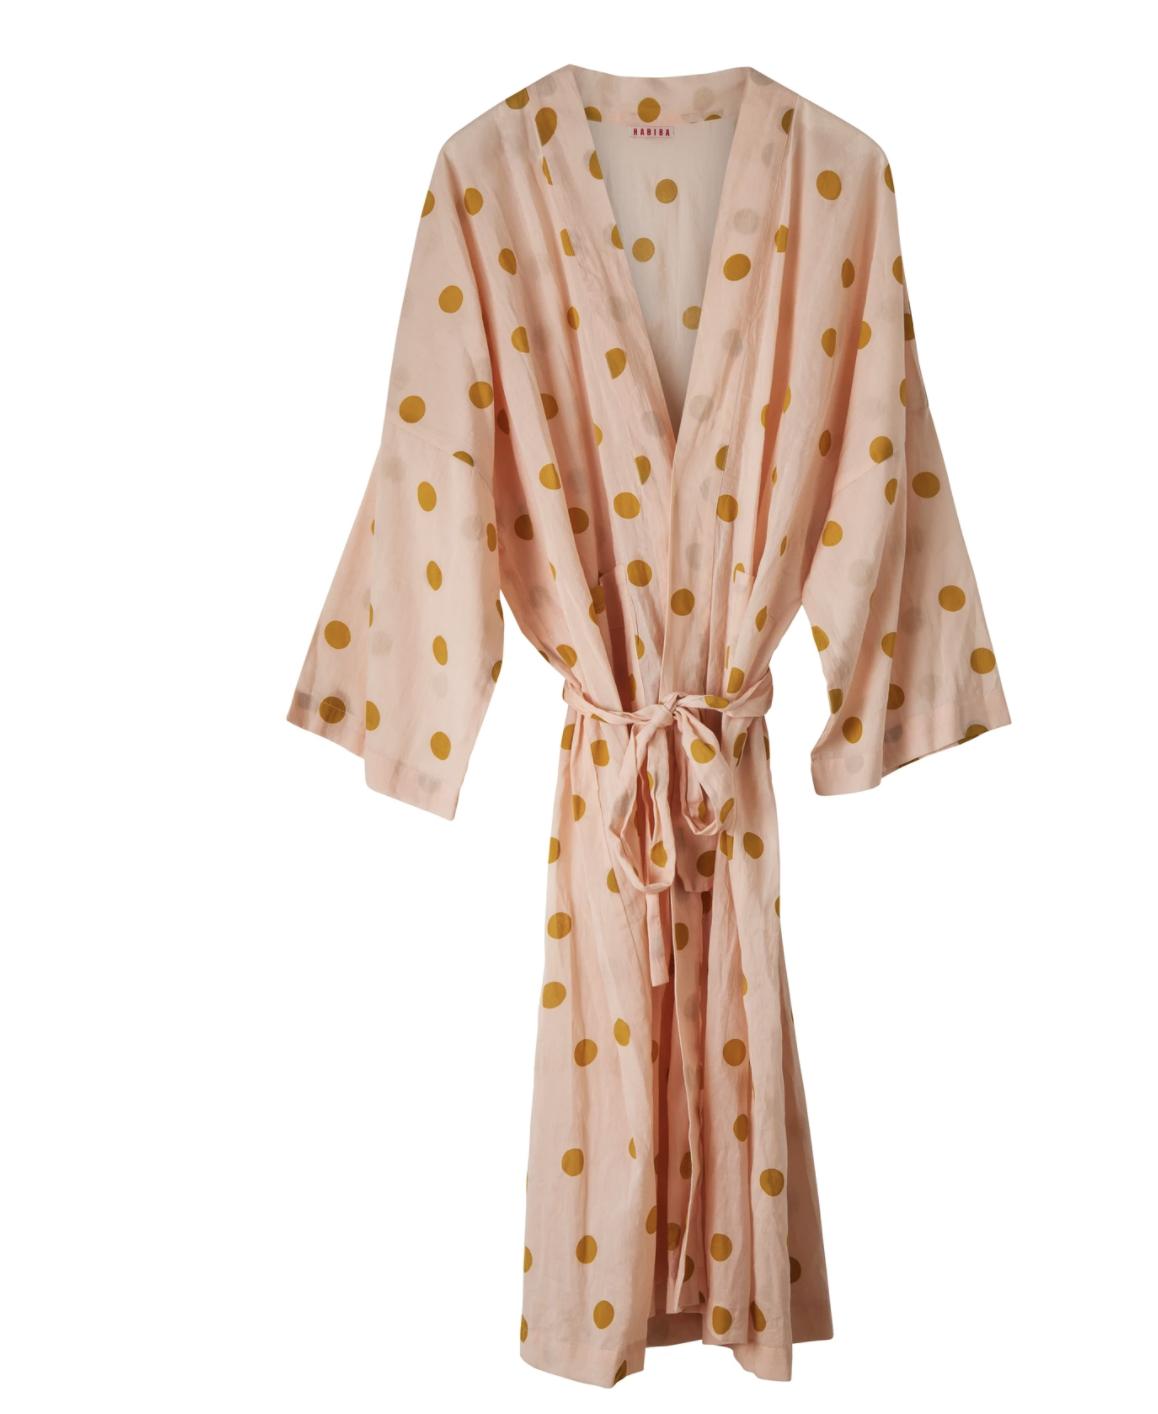 HABIBA - Milla Kimono, Curry